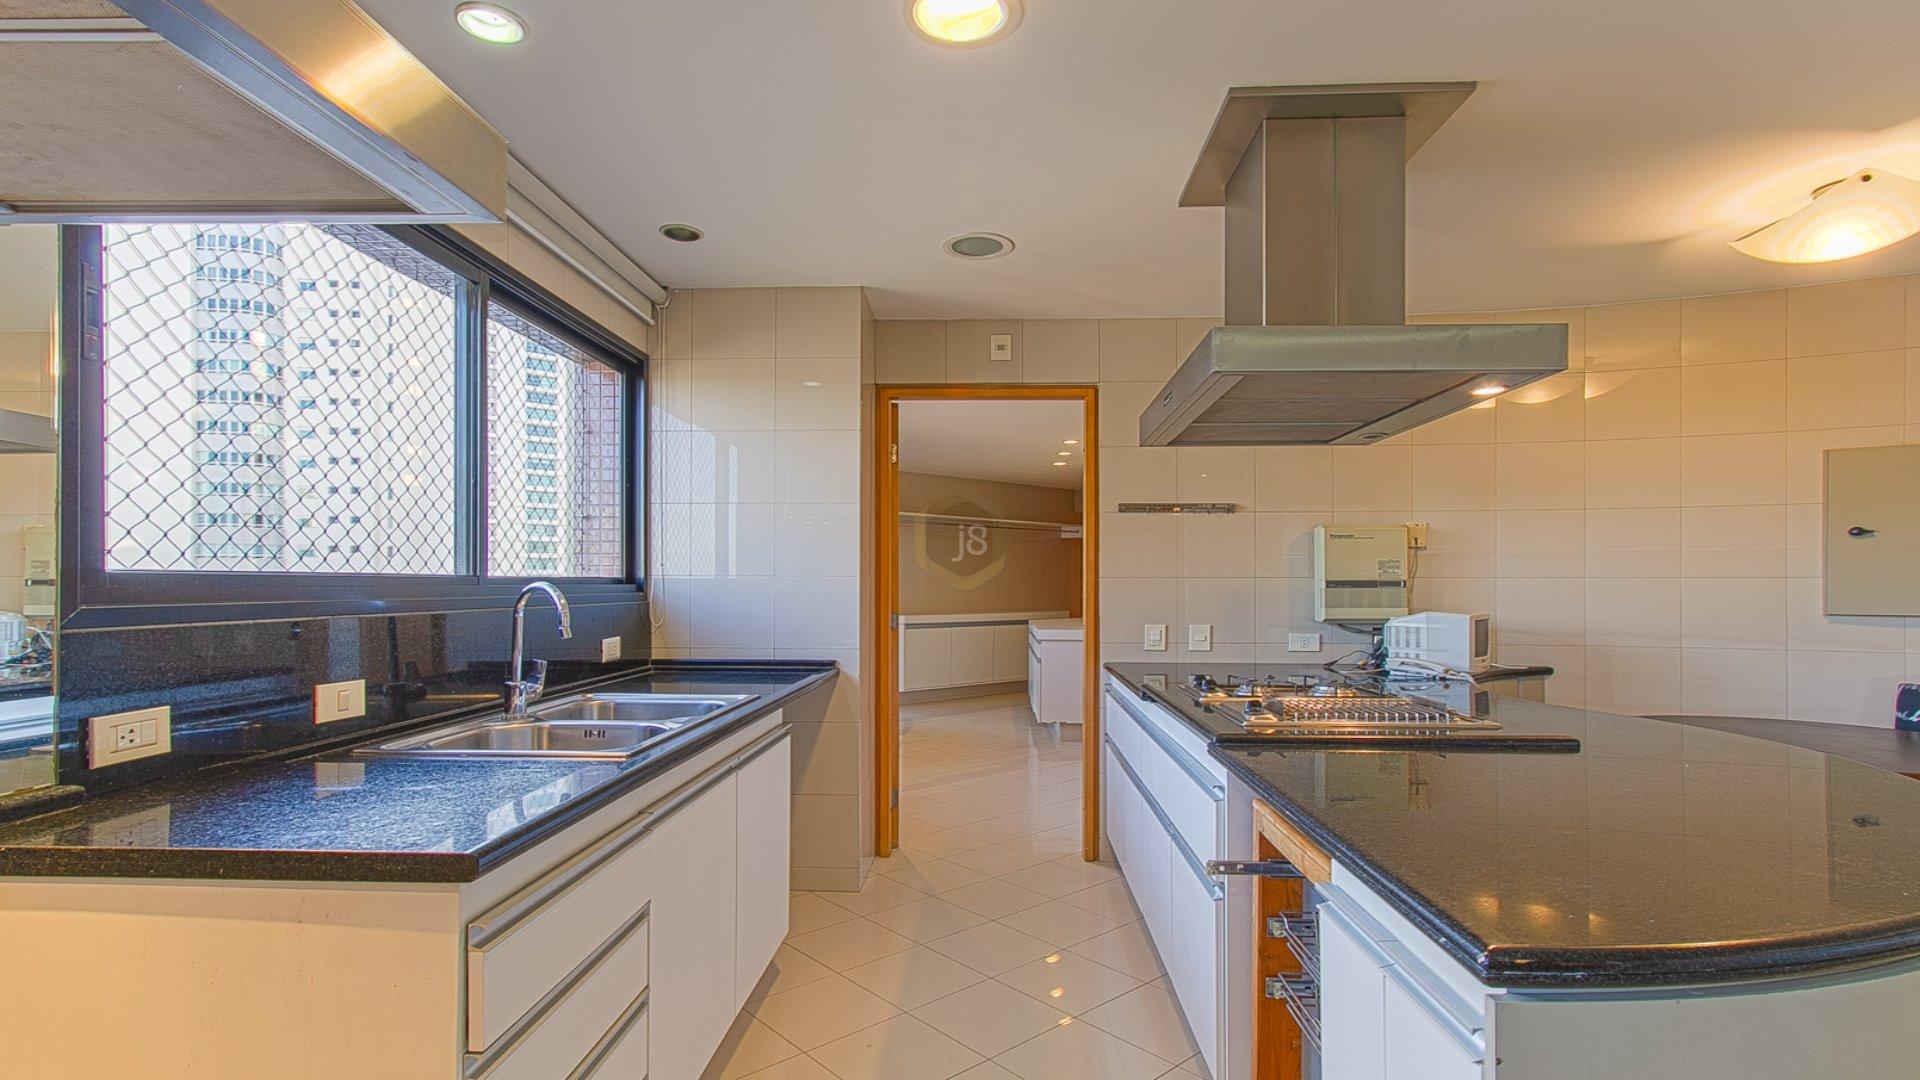 Foto de destaque Clássico apartamento no ecoville ! edifício juarez machado !